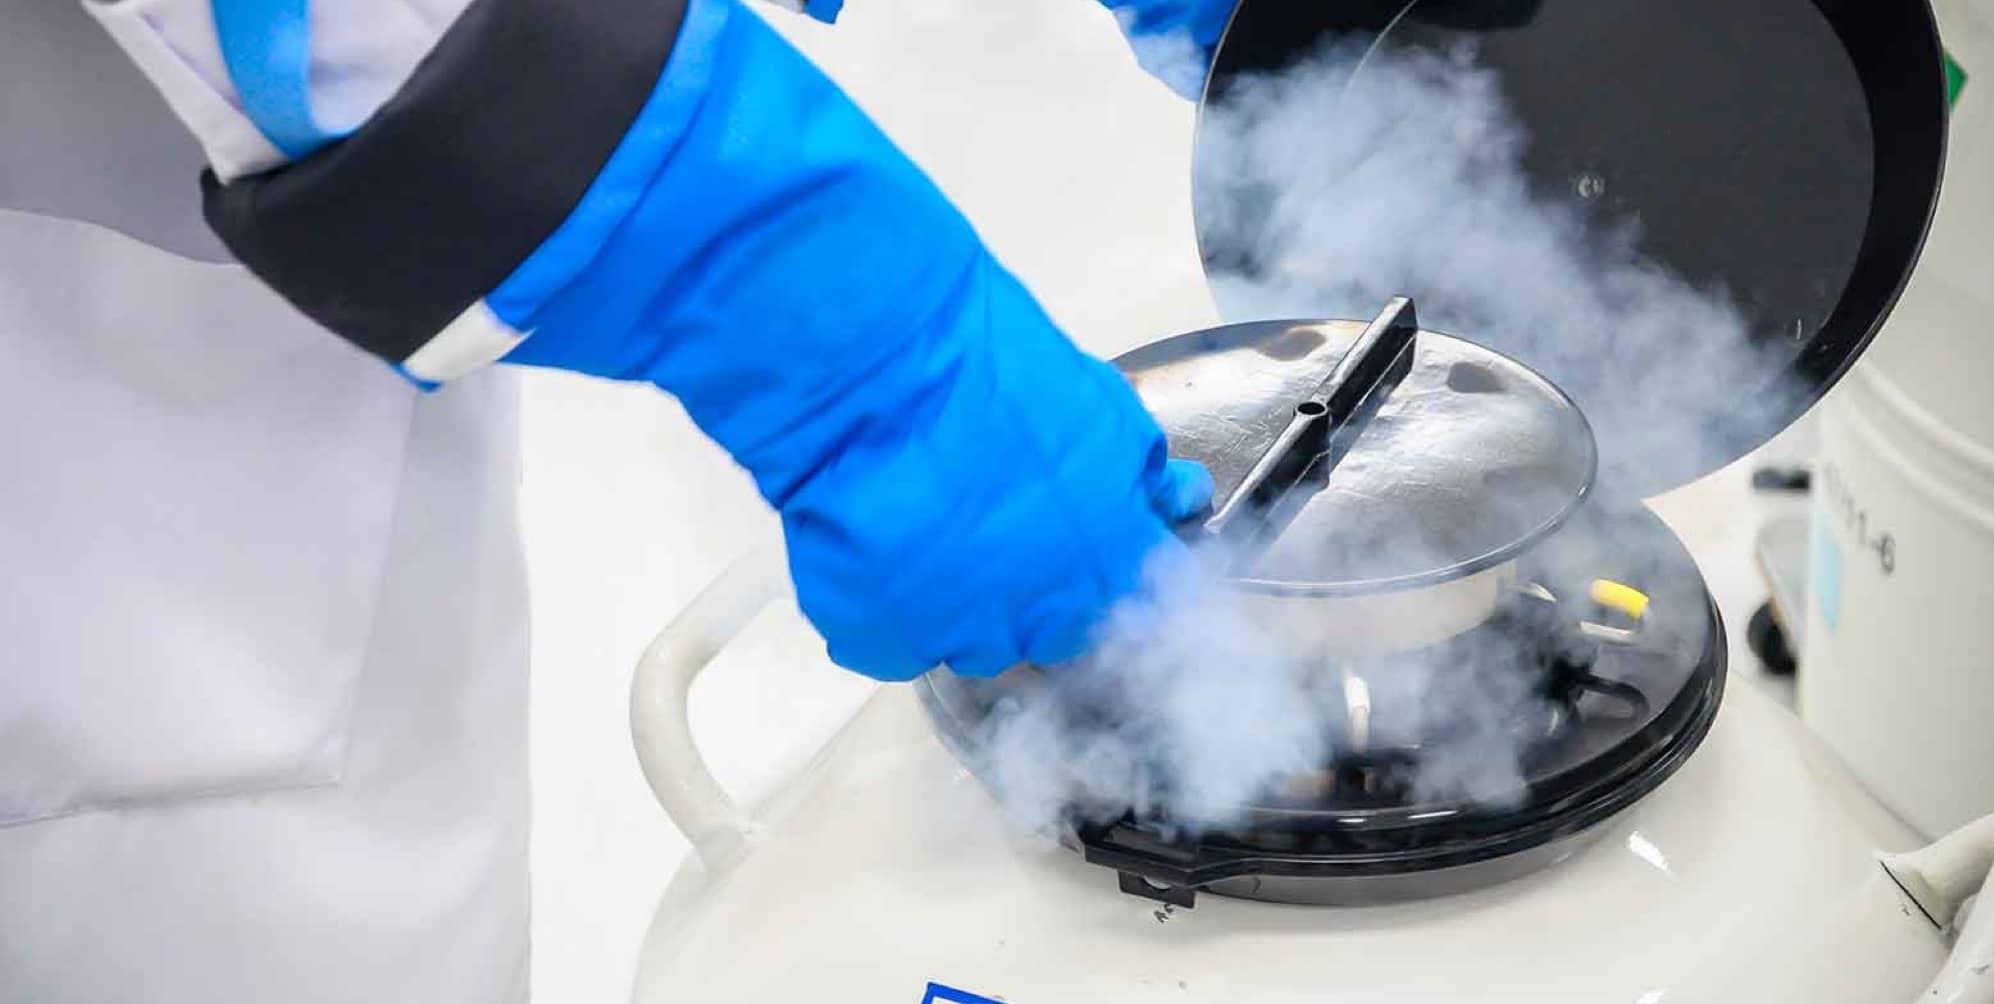 biocair-liquid-nitrogen-samples-courier